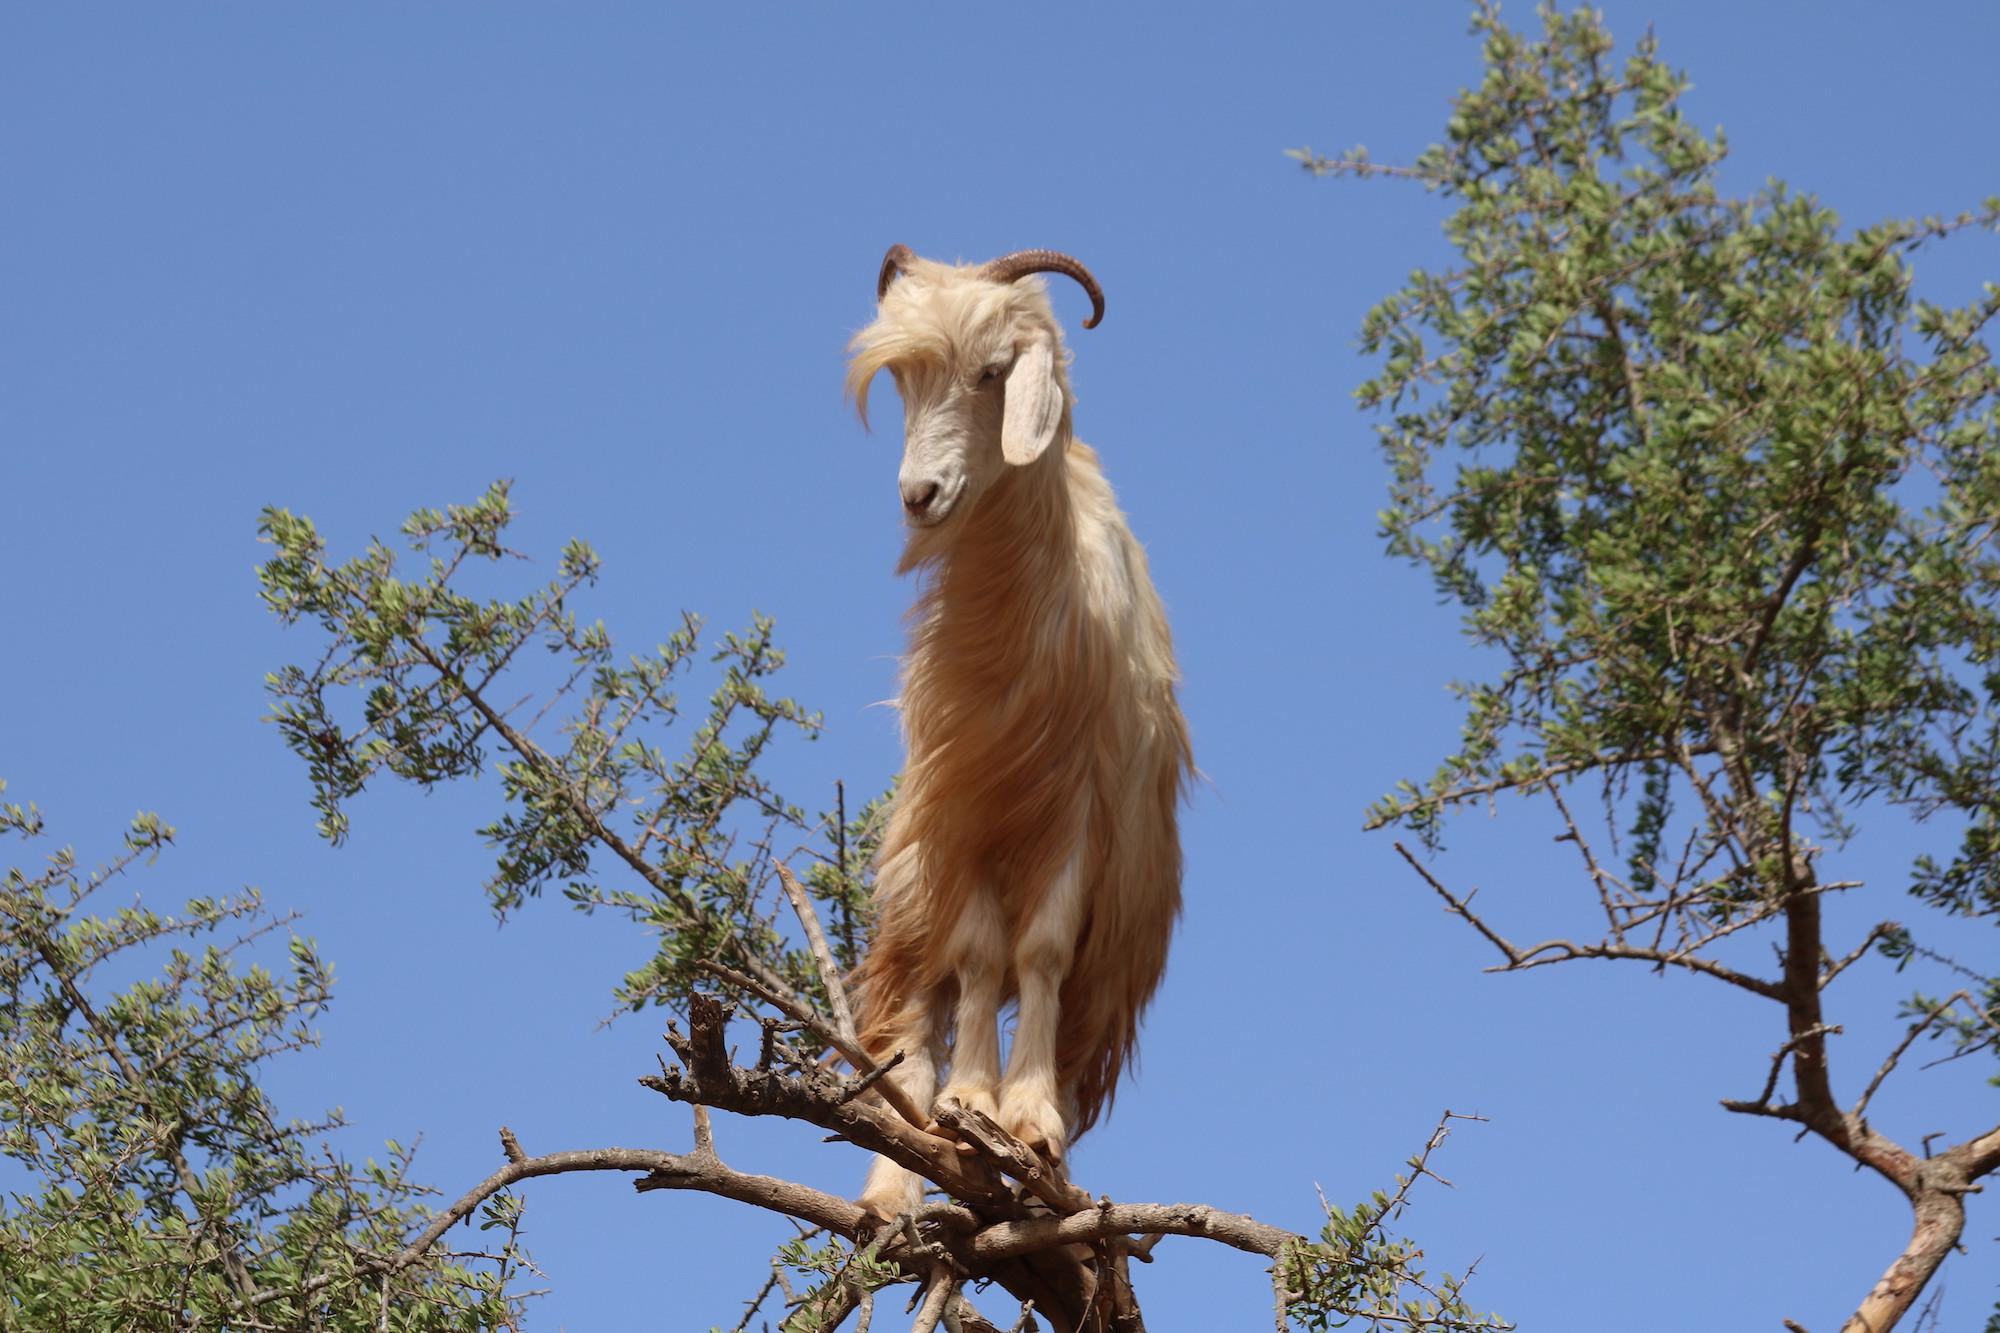 climbing-goat-10.JPG